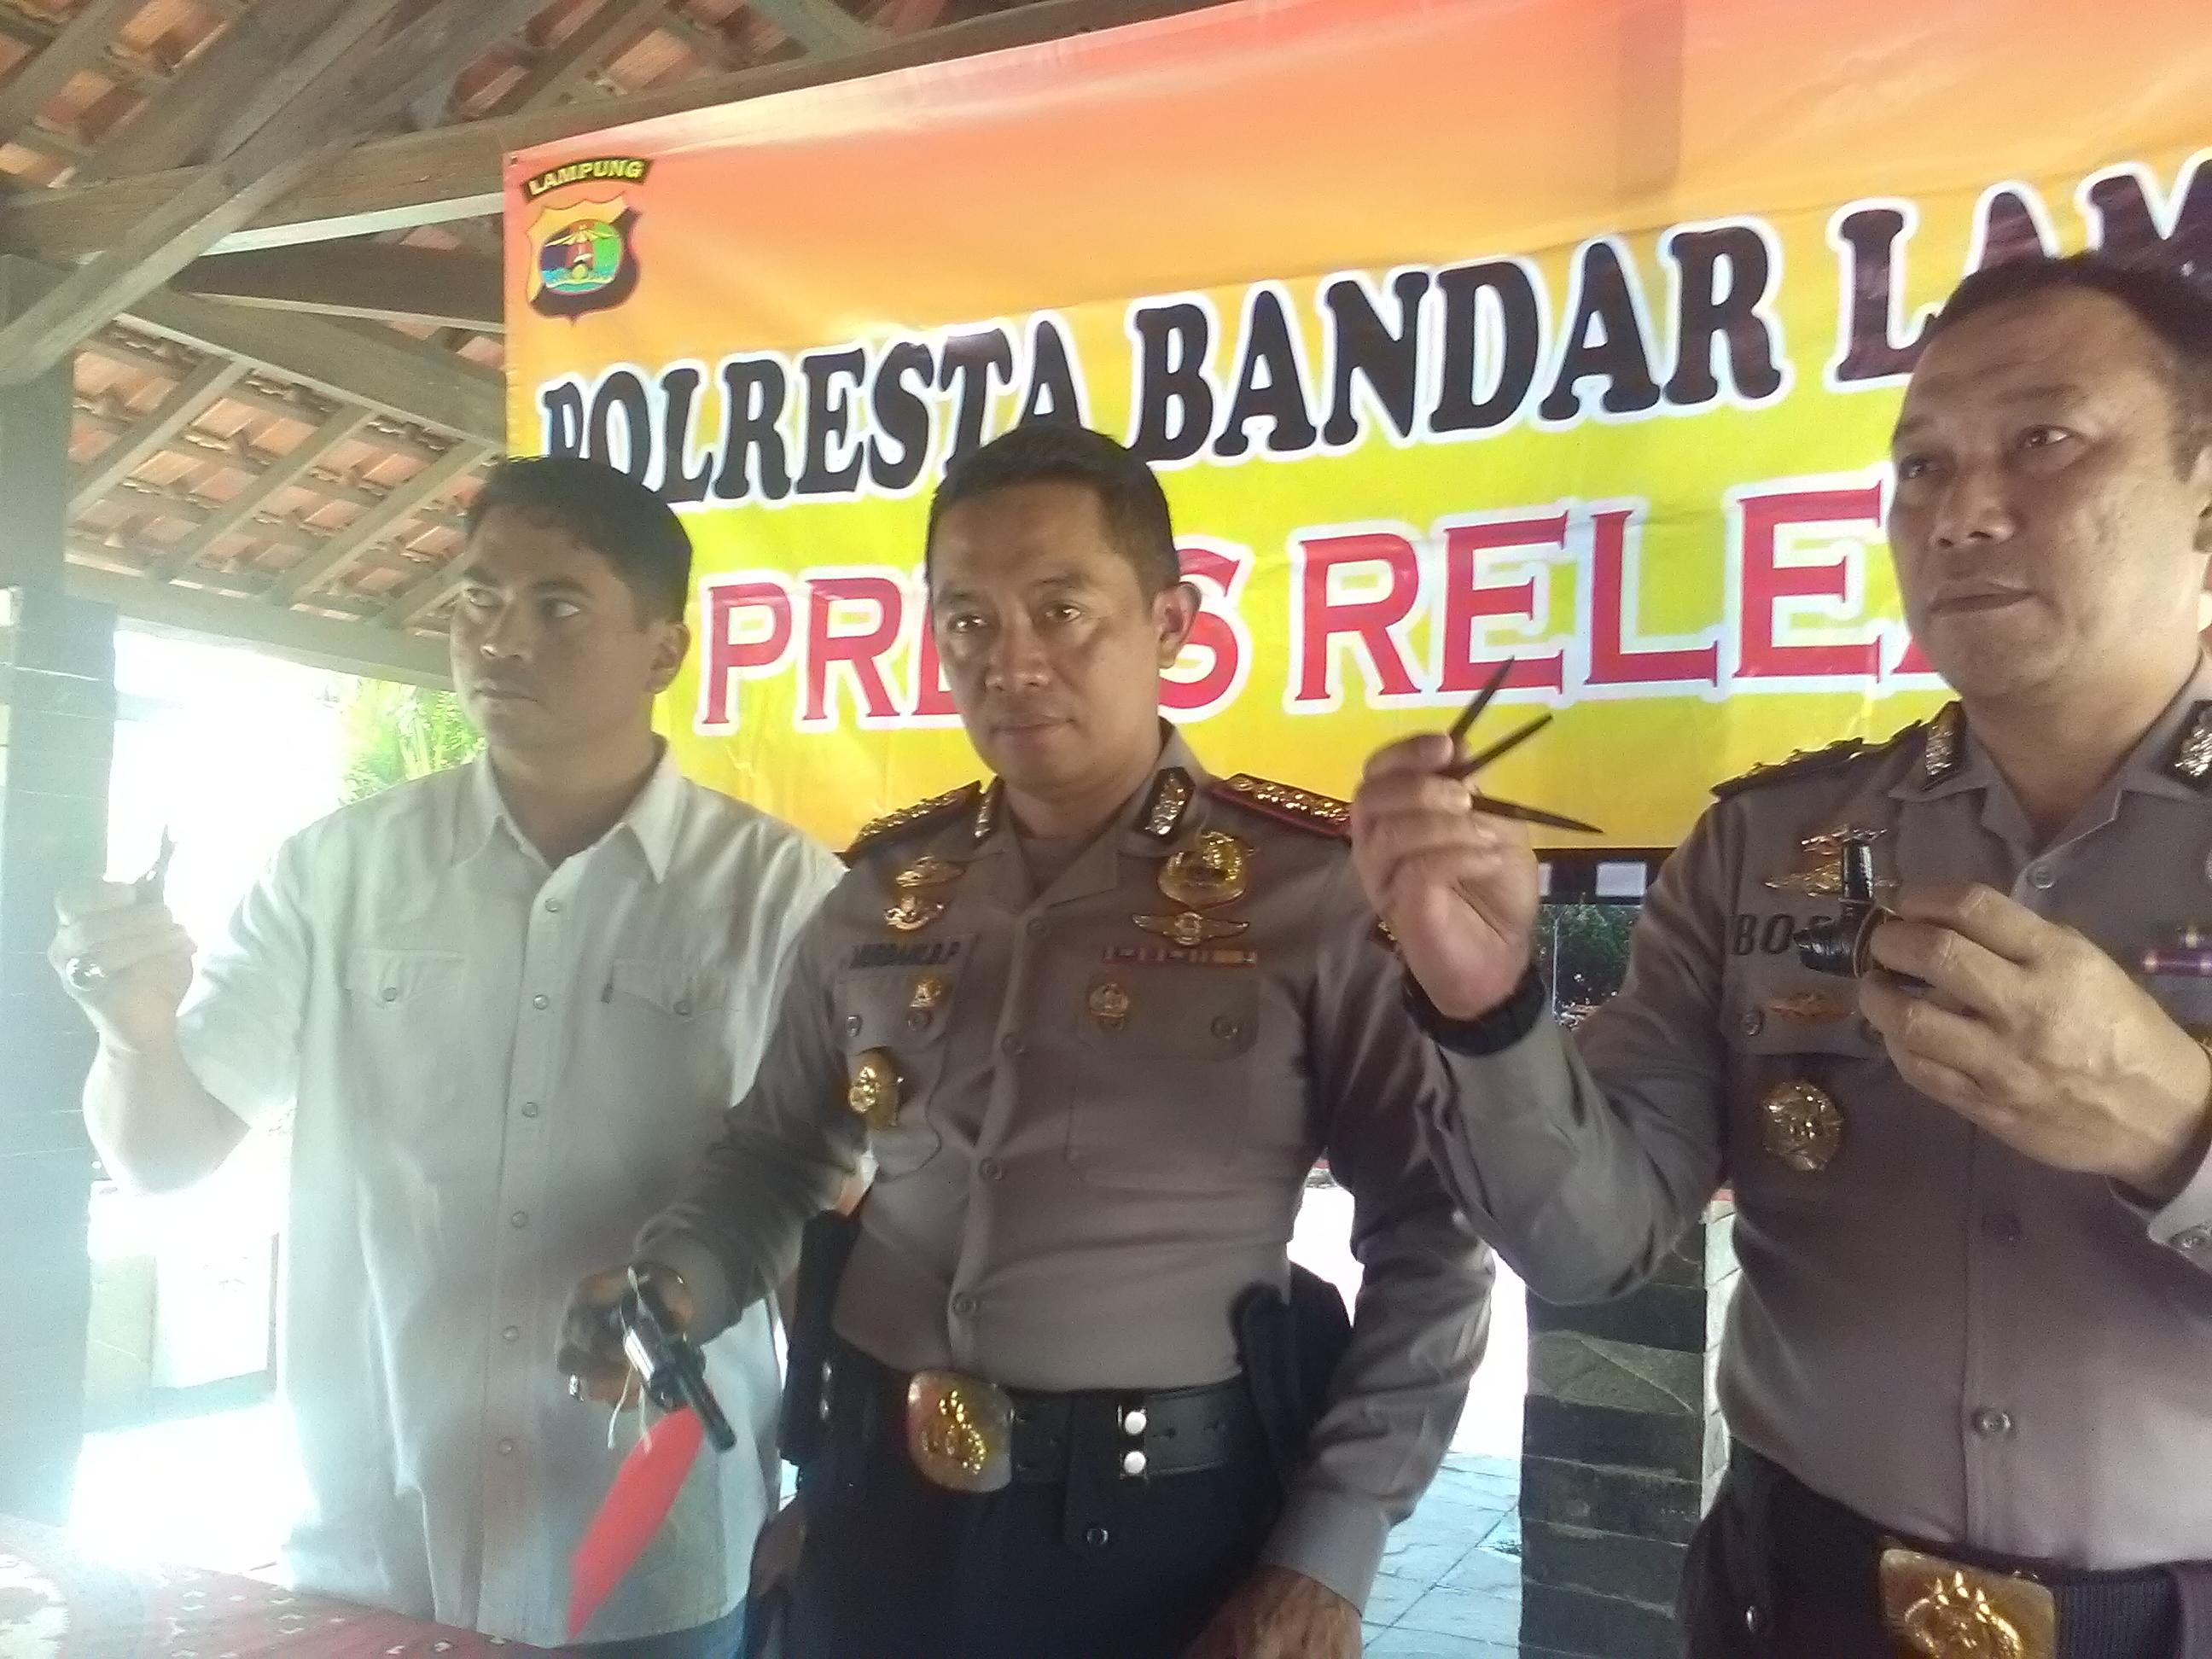 Kapolresta Bandarlampung Kombes Murbani Budi Pitono (tengah) menunjukkan pistol yang digunakan pelaku pembegalan. (Lampungnews/Adam)